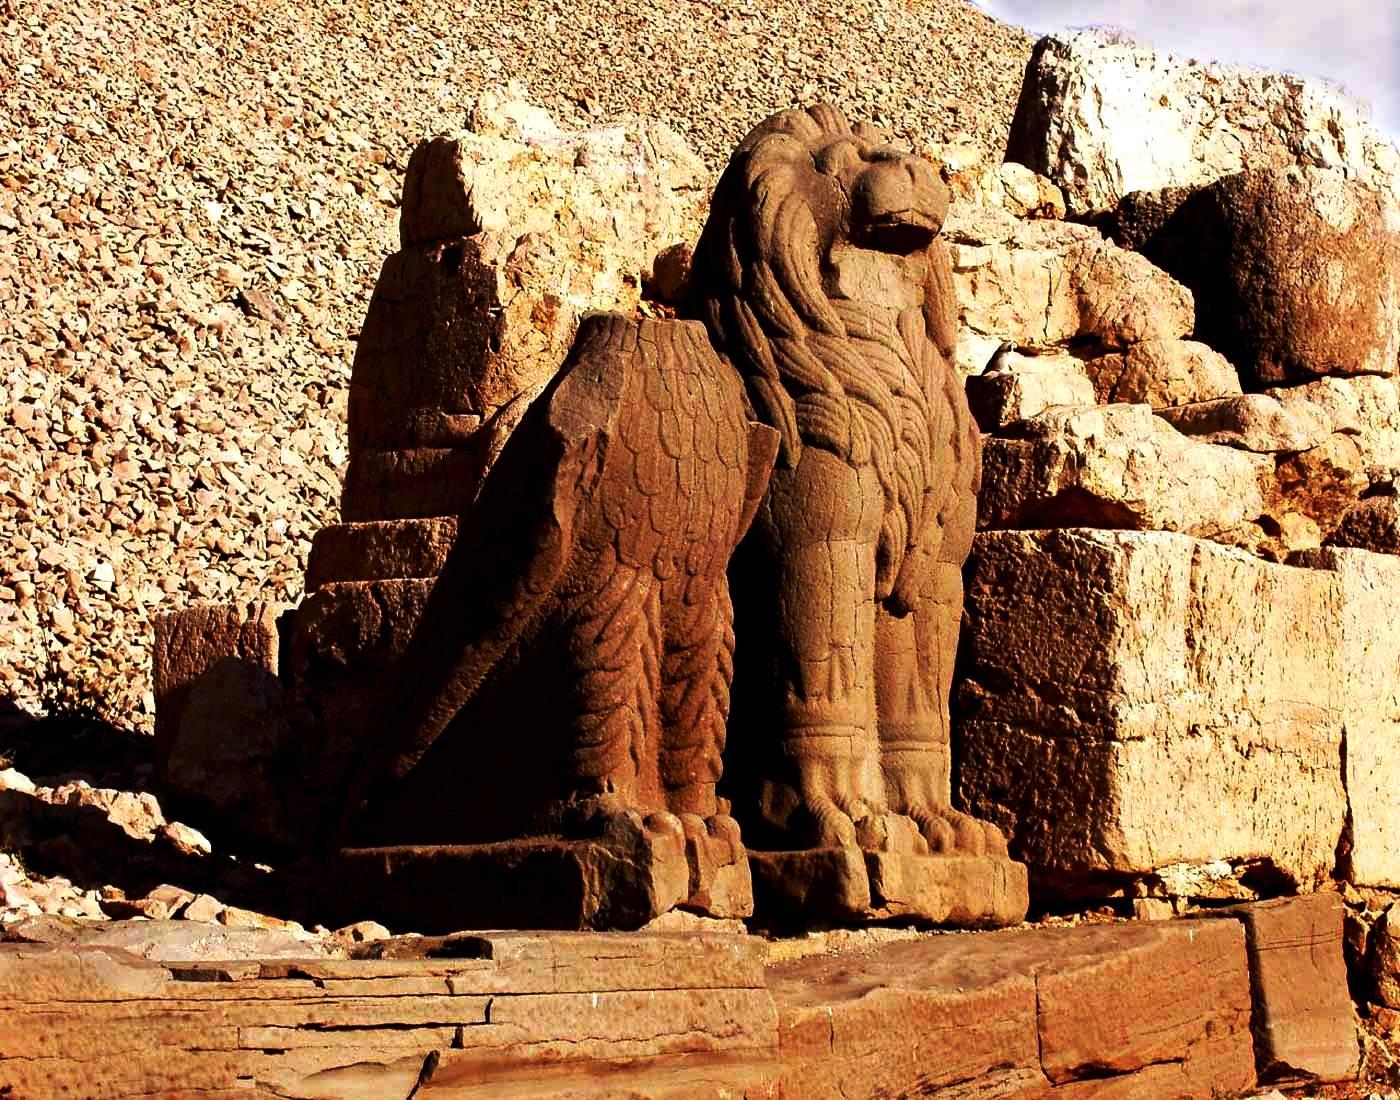 статуи зверей на немрут-даге